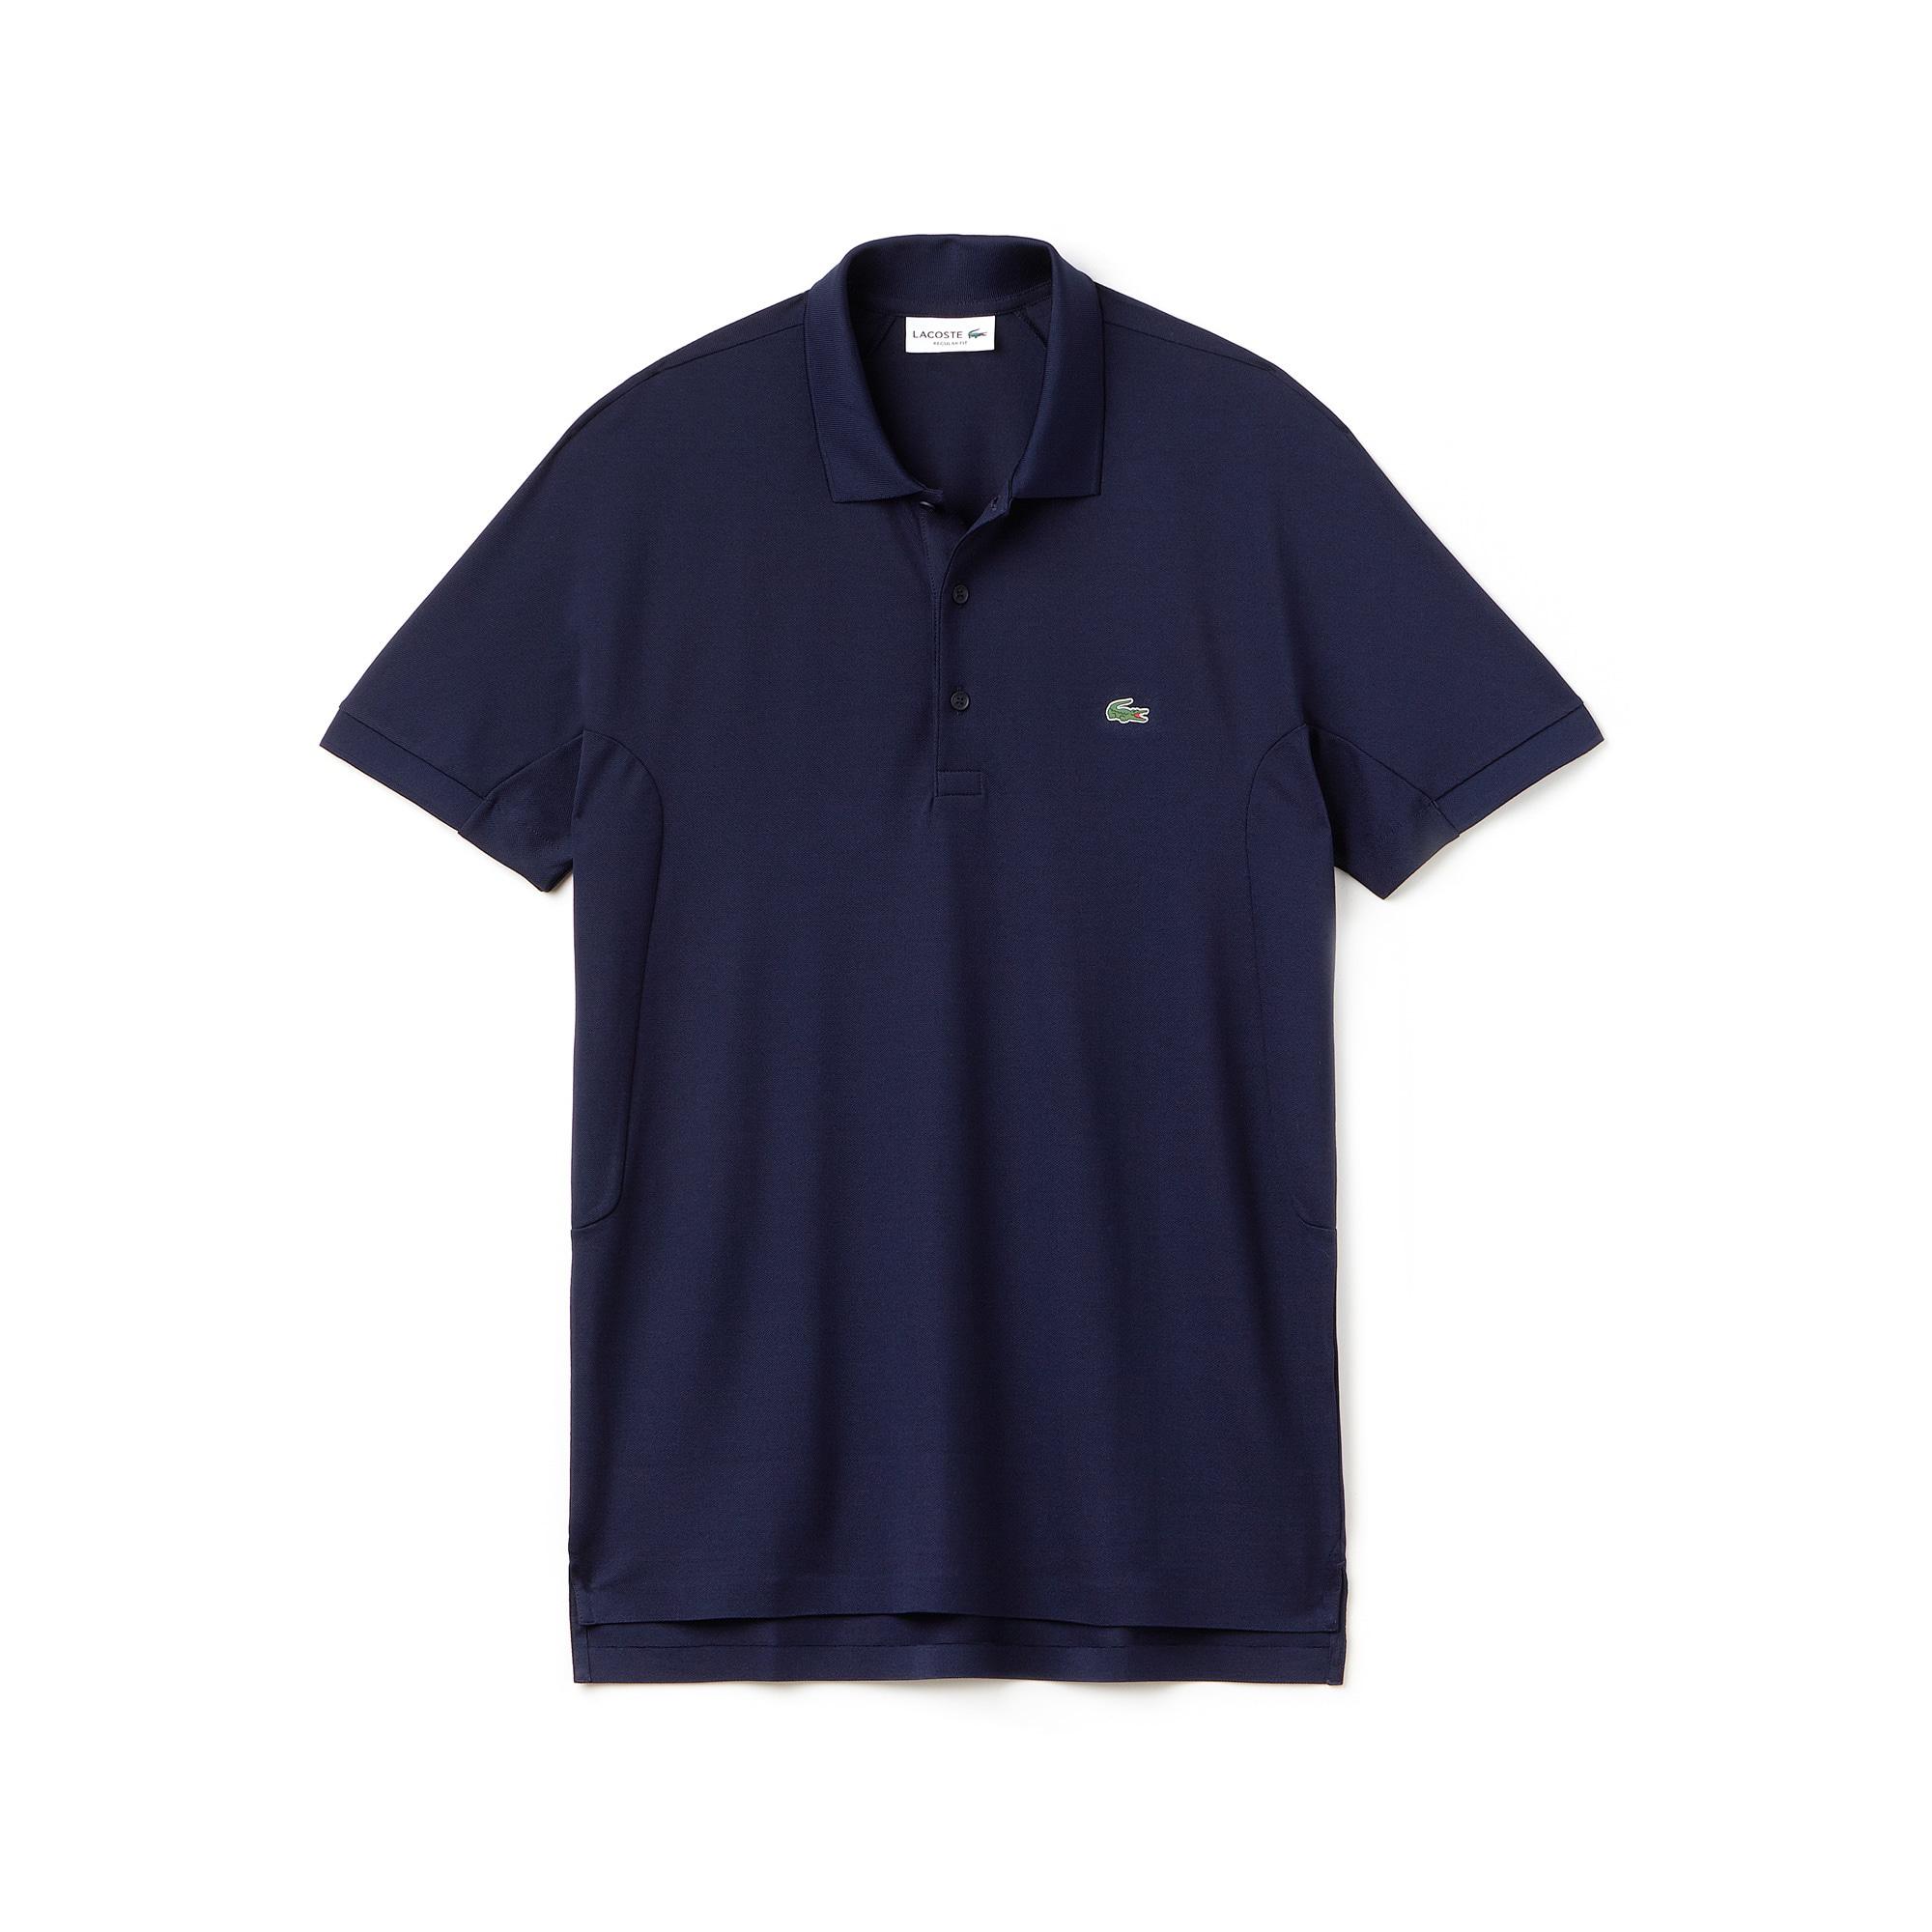 Men's Lacoste 85th Anniversary Limited Edition Tech Piqué Polo